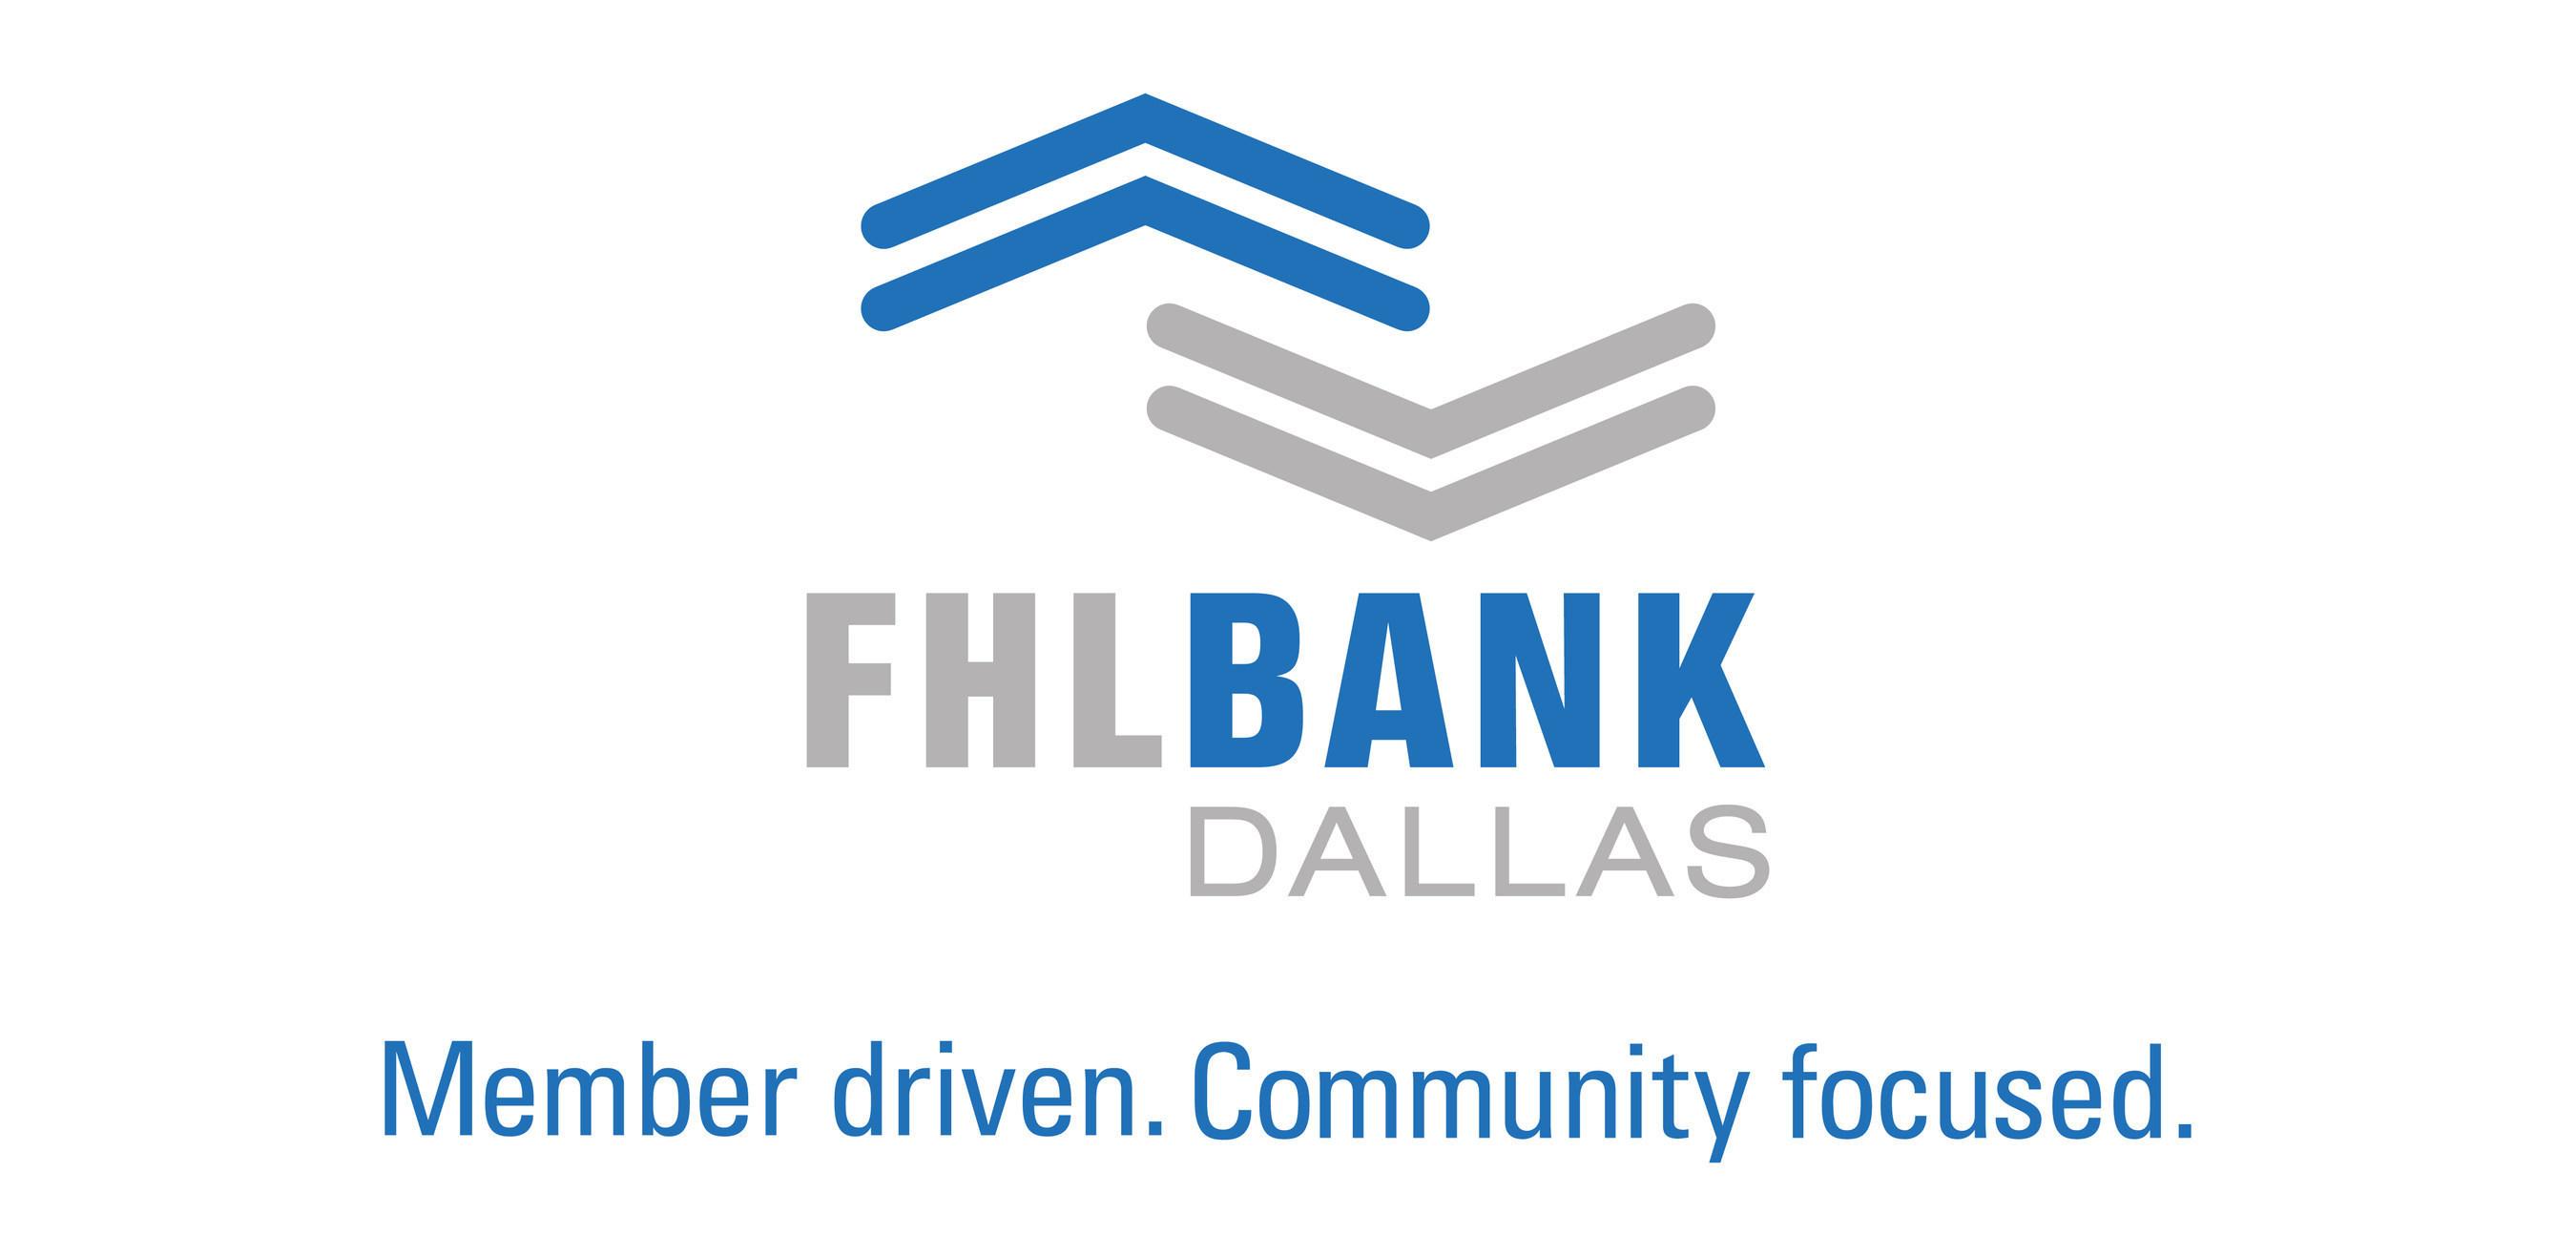 Federal Home Loan Bank of Dallas